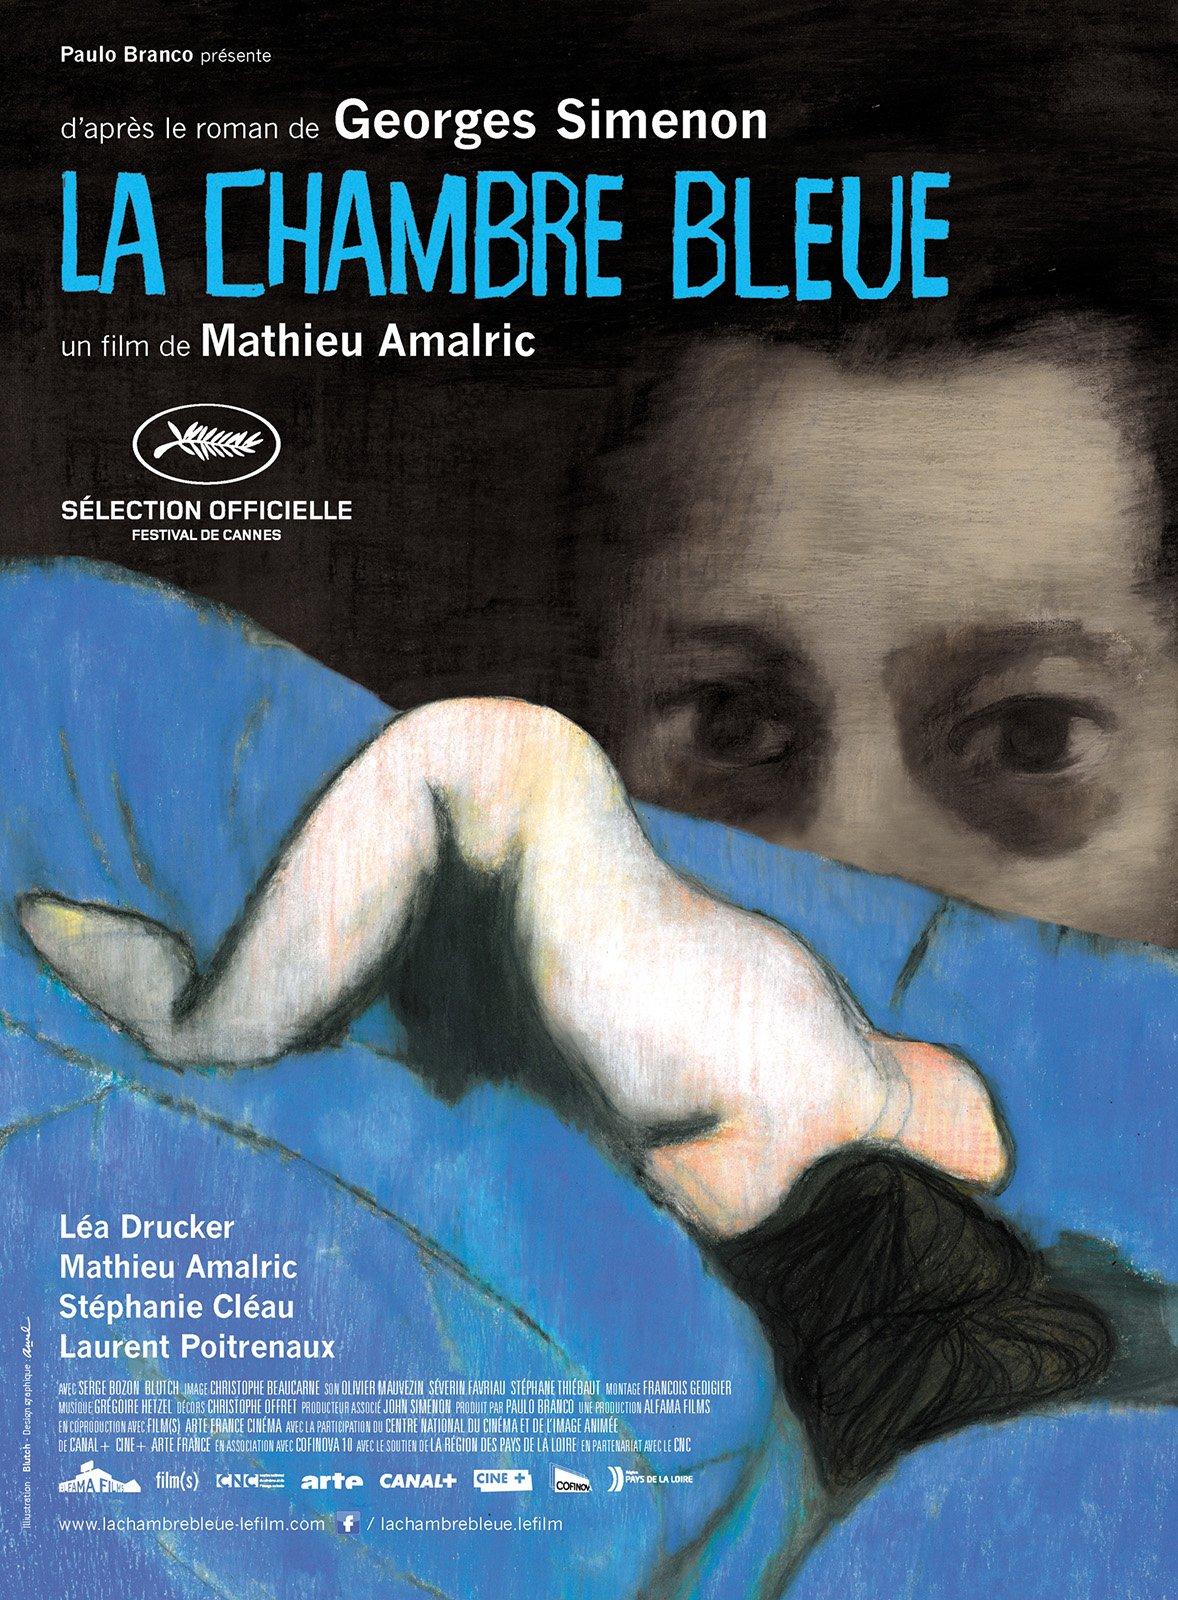 [UL.TO]    La Chambre Bleue FR XVID 2014  [DVDRIP]